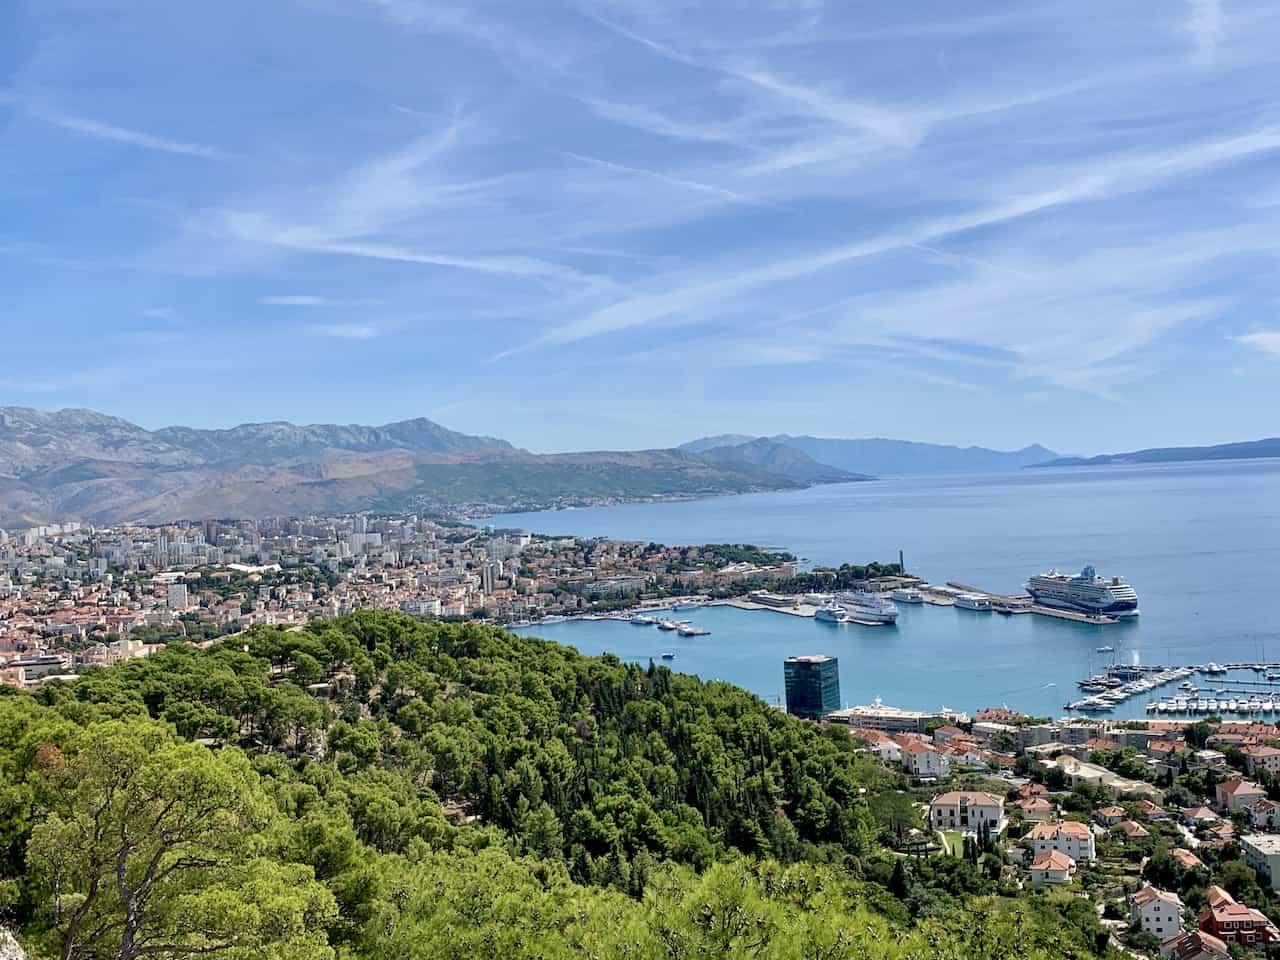 Marjan Hill Viewpoint